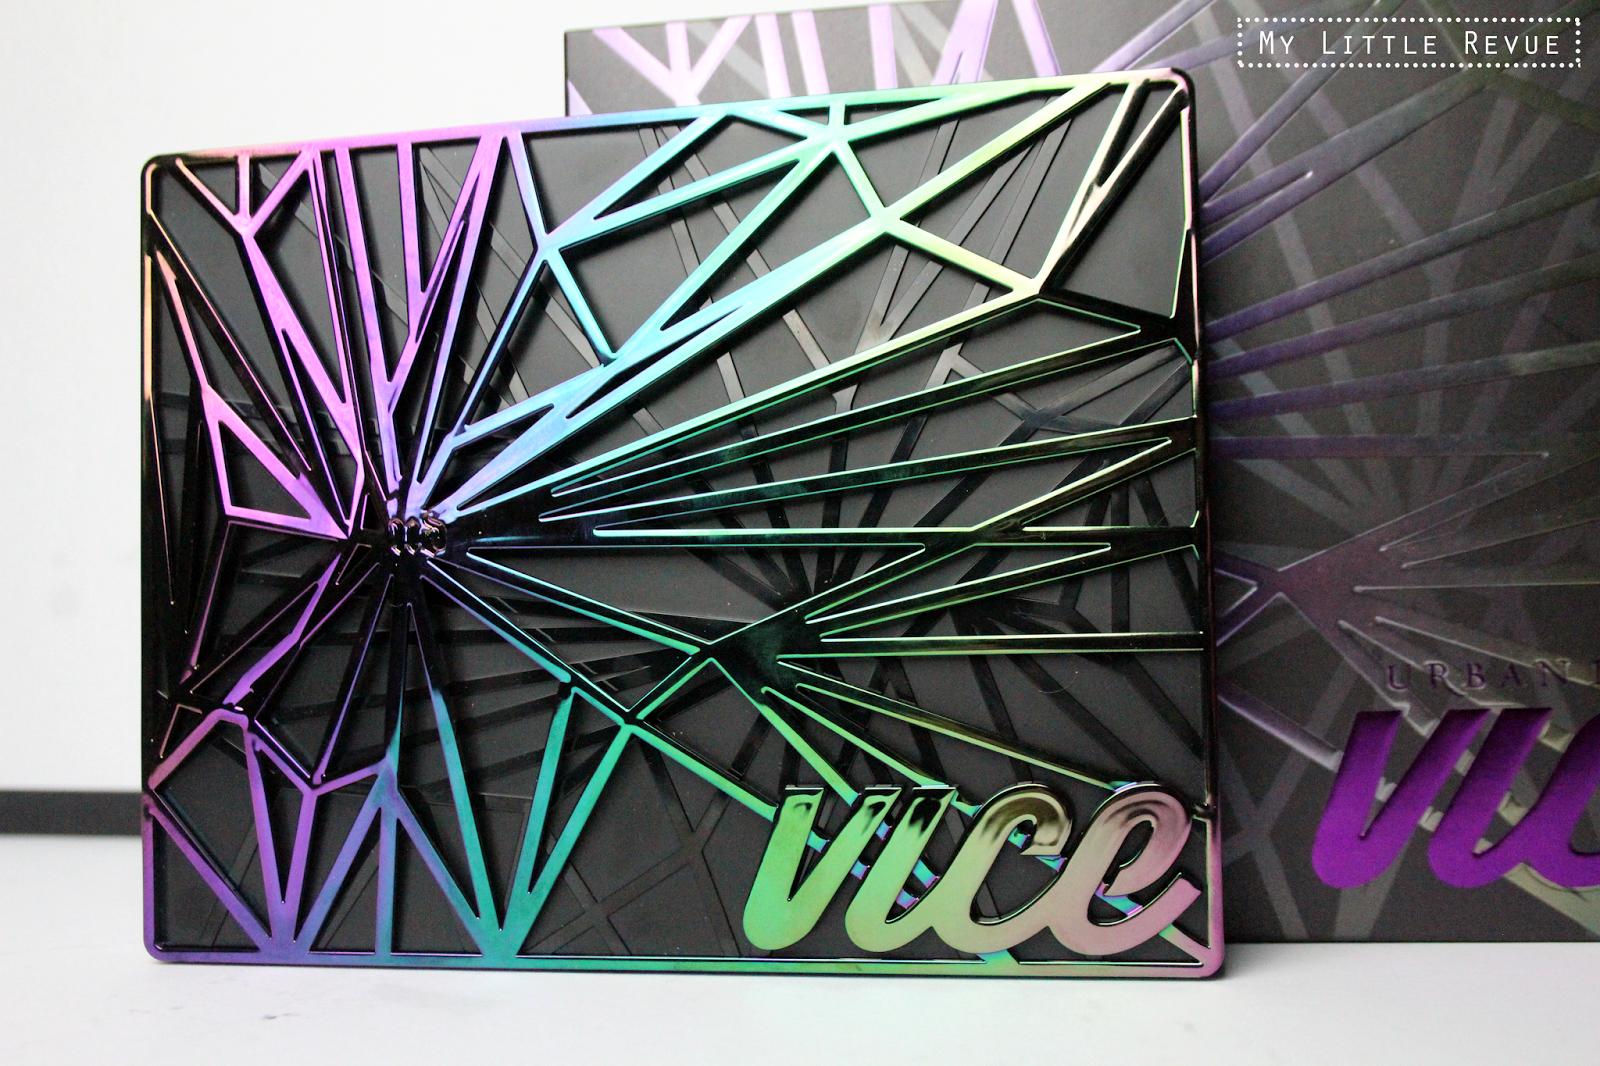 vice 4 d'urban decay revue